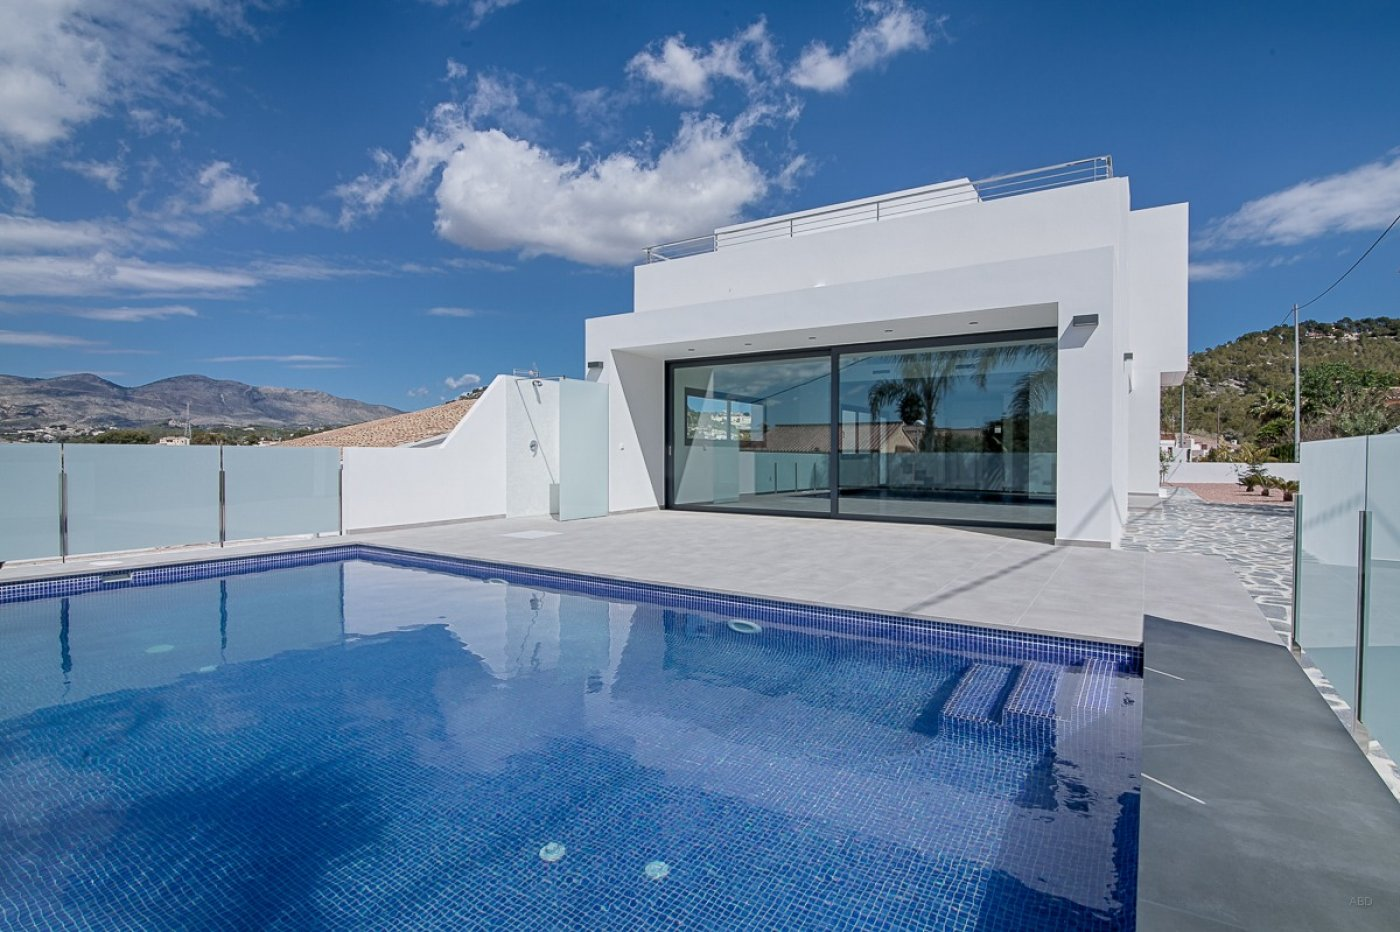 Villa - Nieuwbouw - Cometa - Calpe